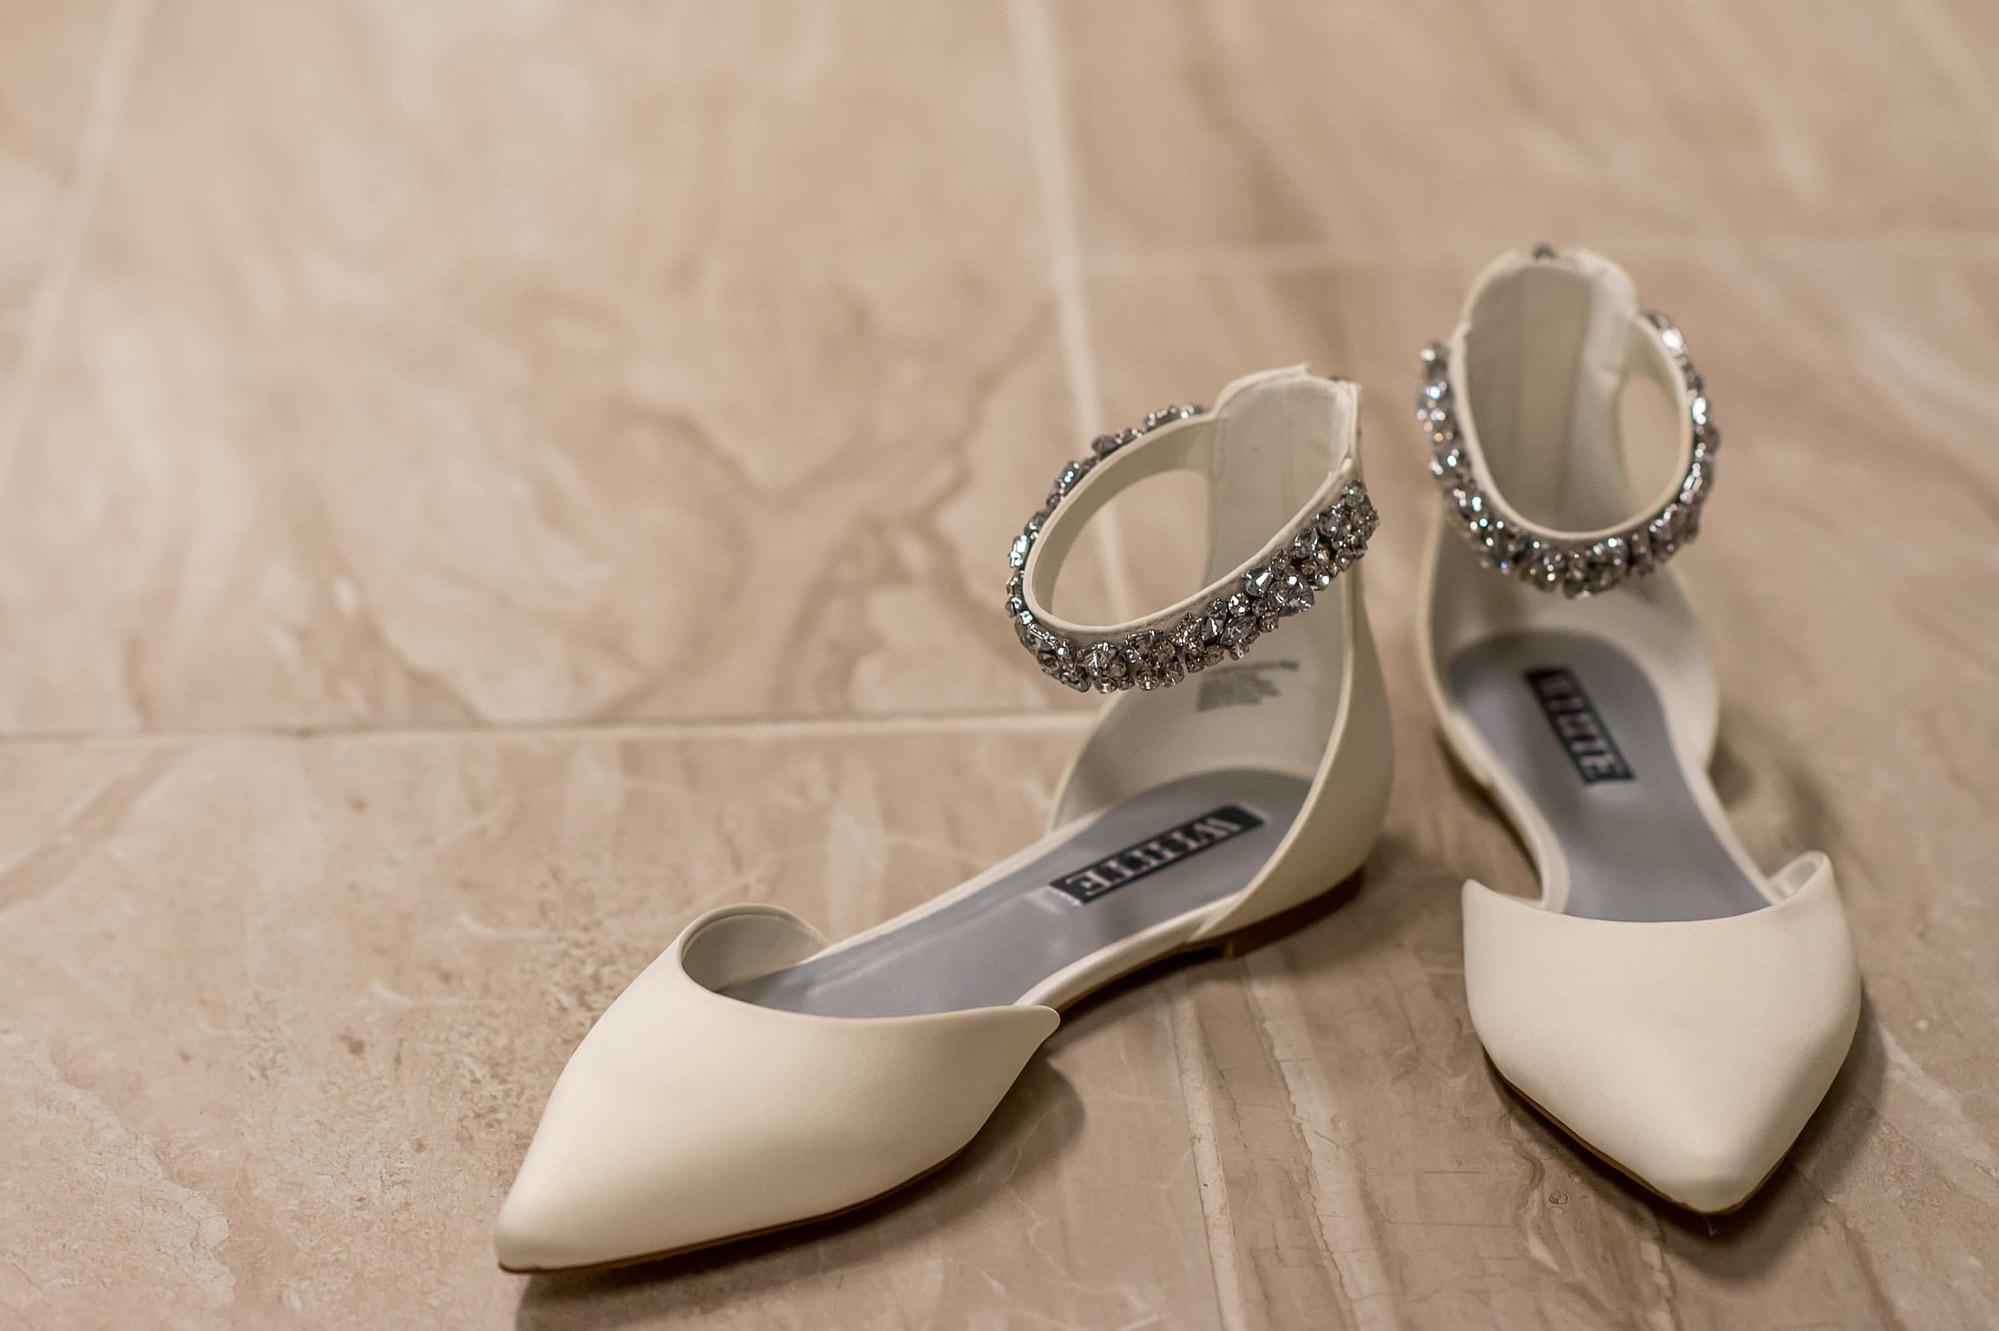 Shoes during a Blessed Sacrament Denver wedding.